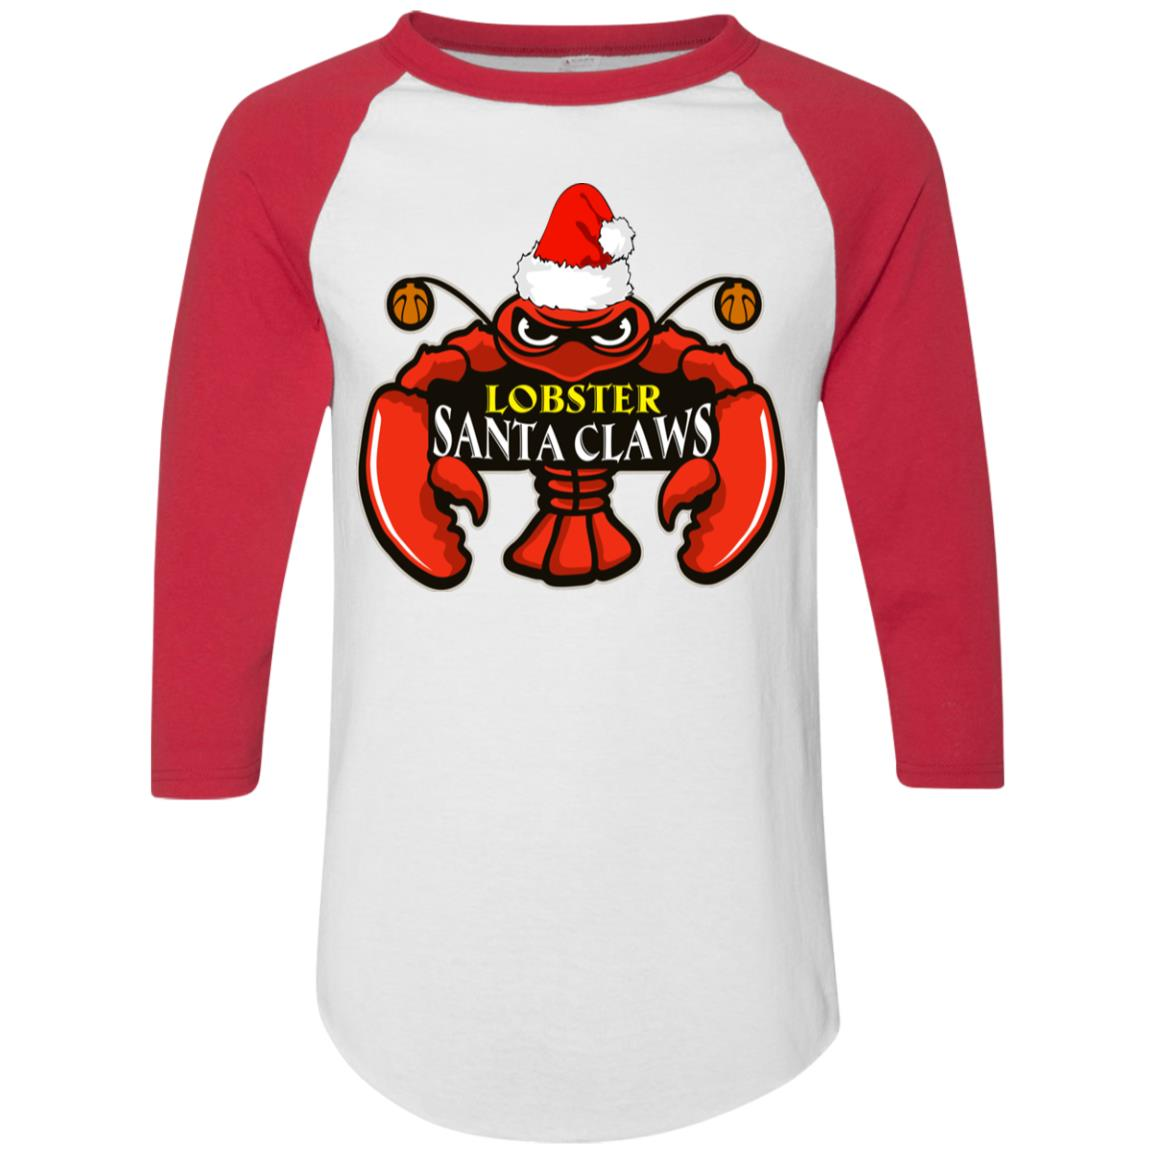 Christmas Shirt.Lobster Santa Claws Christmas Shirt Long Sleeve Sweater Hoodie